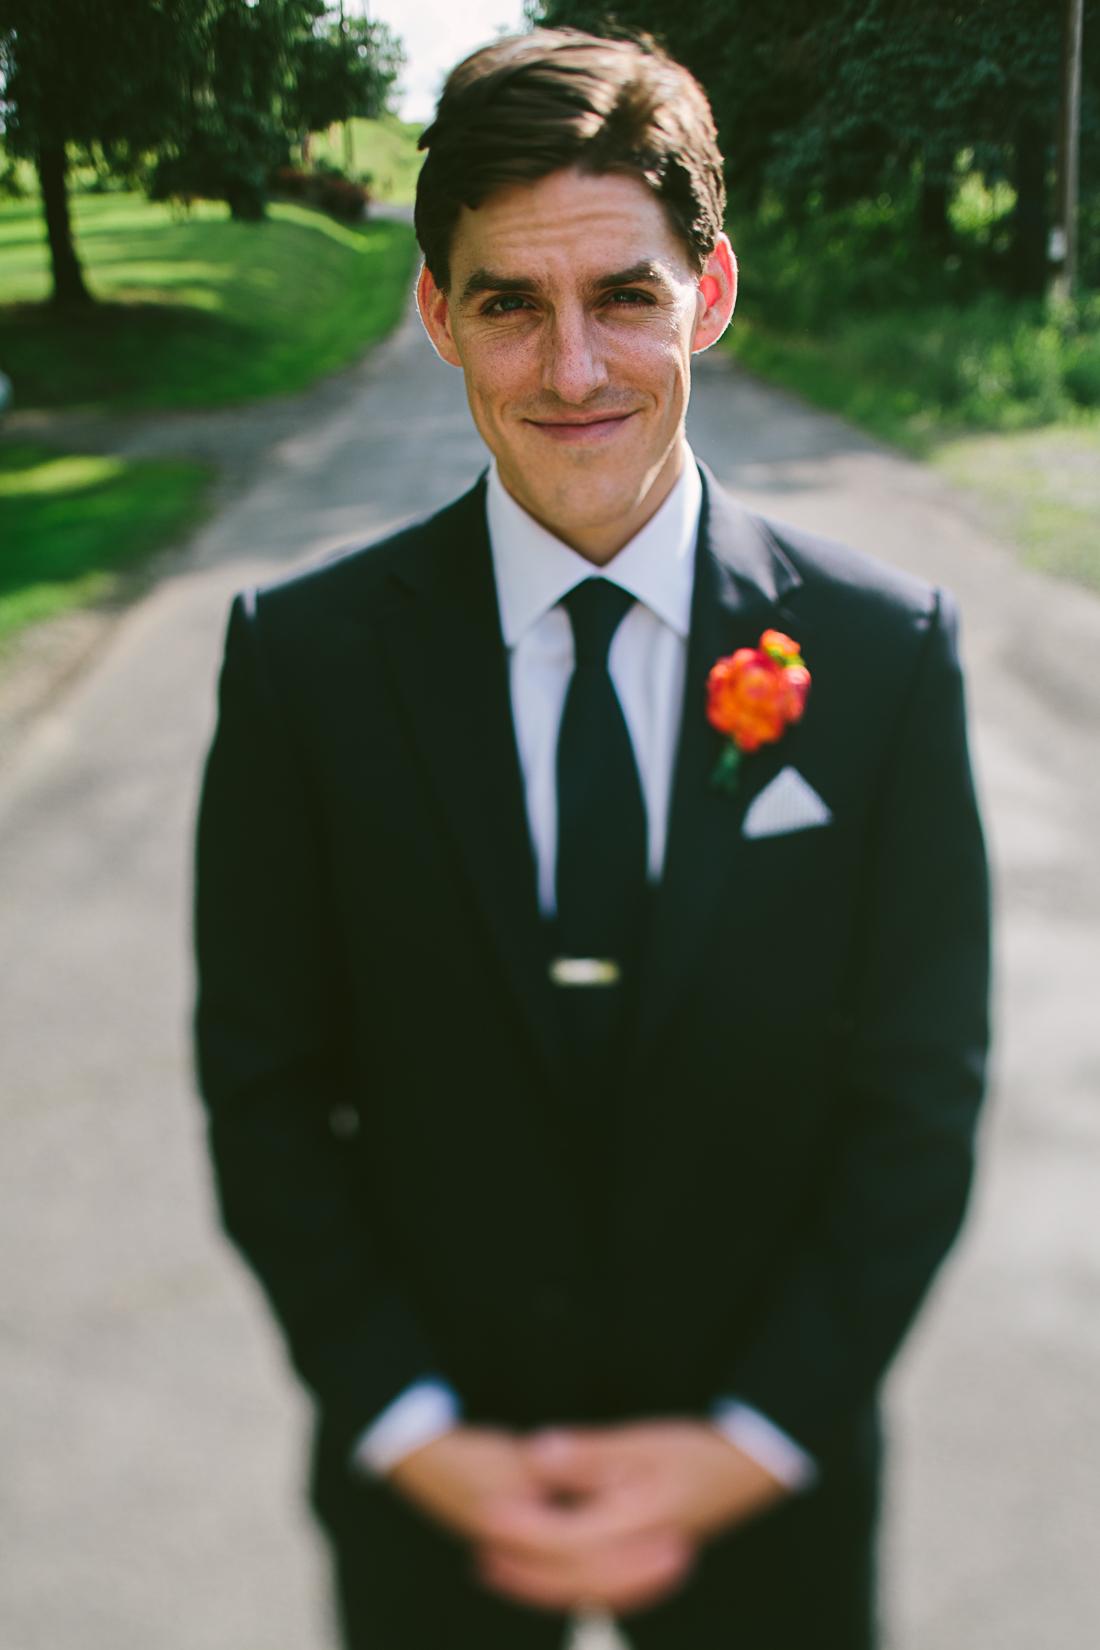 wedding teasers-34.jpg